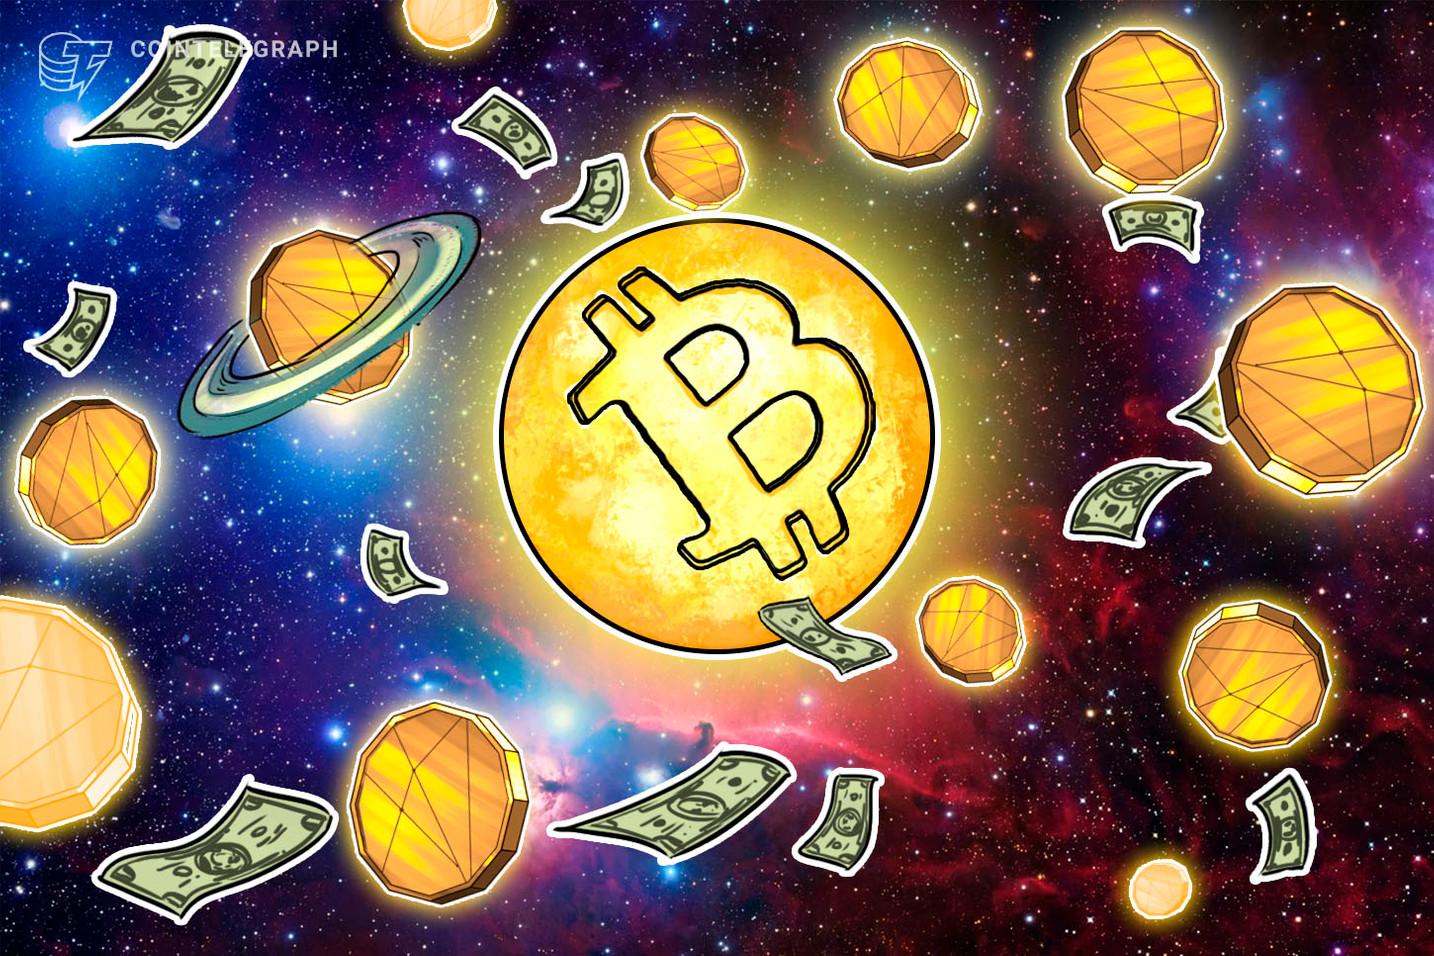 Bitcoin è una 'scommessa convessa', spiega il CEO di One River Digital Asset Management